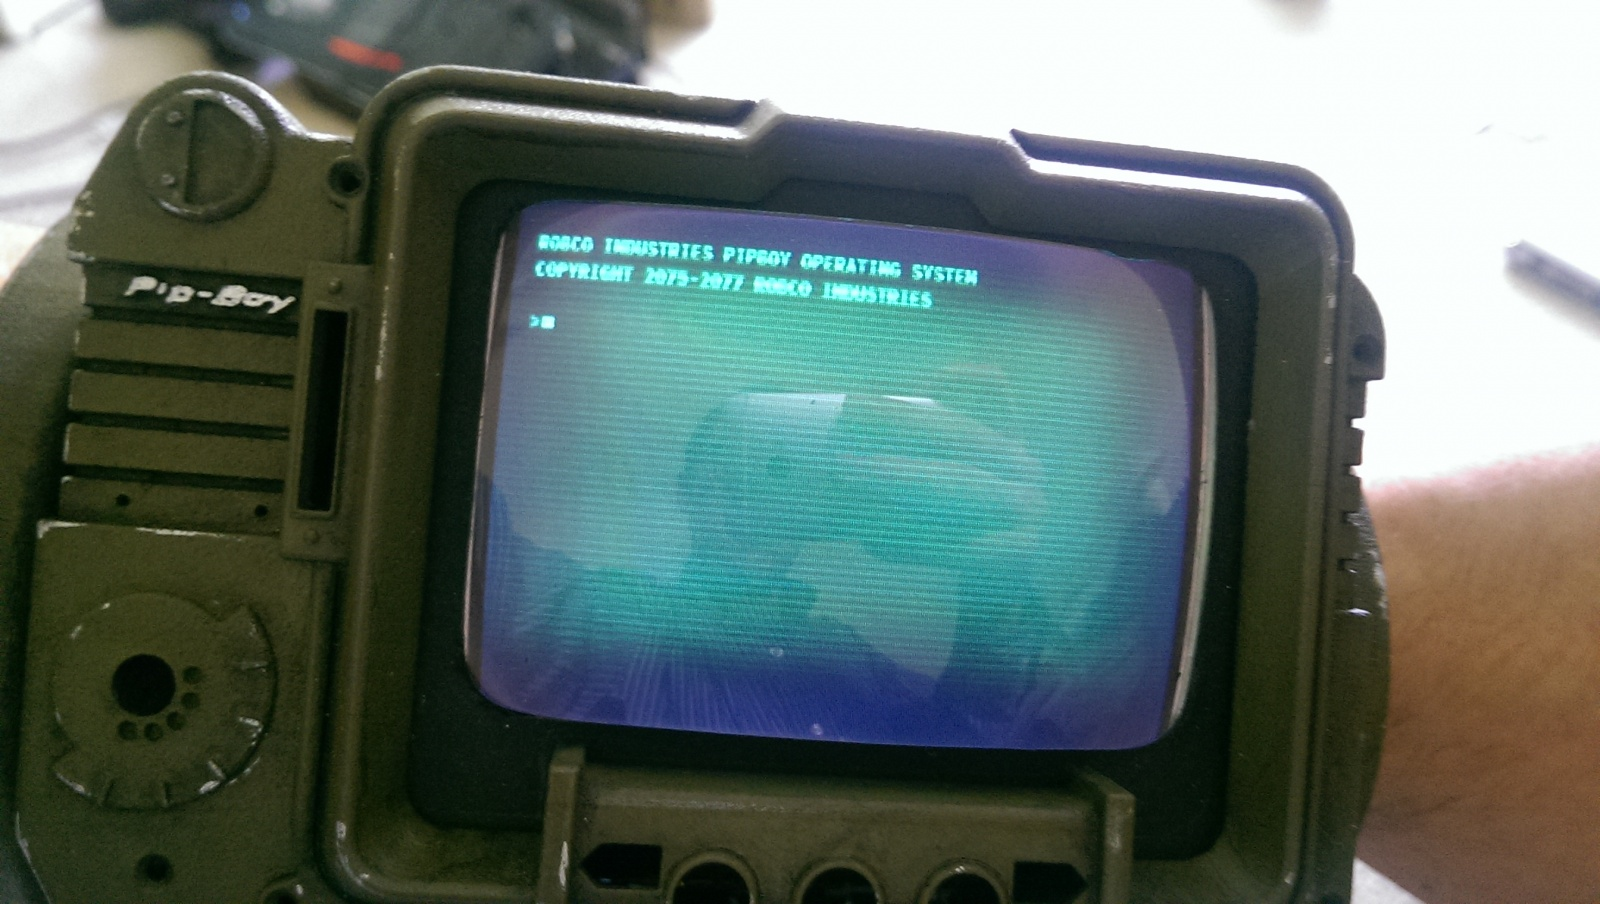 PipBoy из Fallout 3 на Raspberry Pi - 8